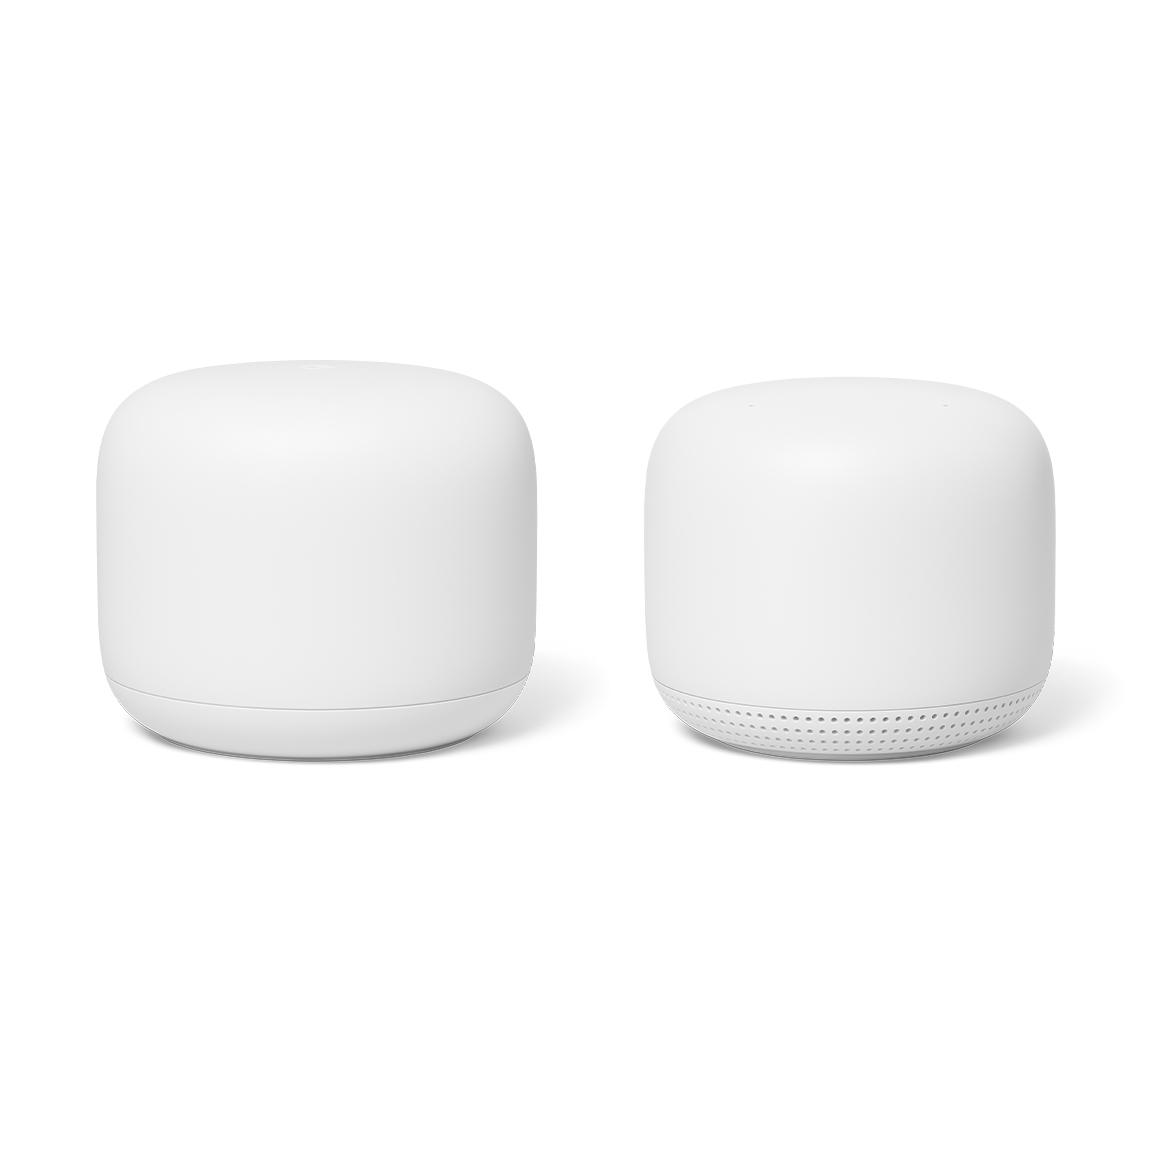 Google Nest Wifi 2 pack 1 Router en 1 Access Point